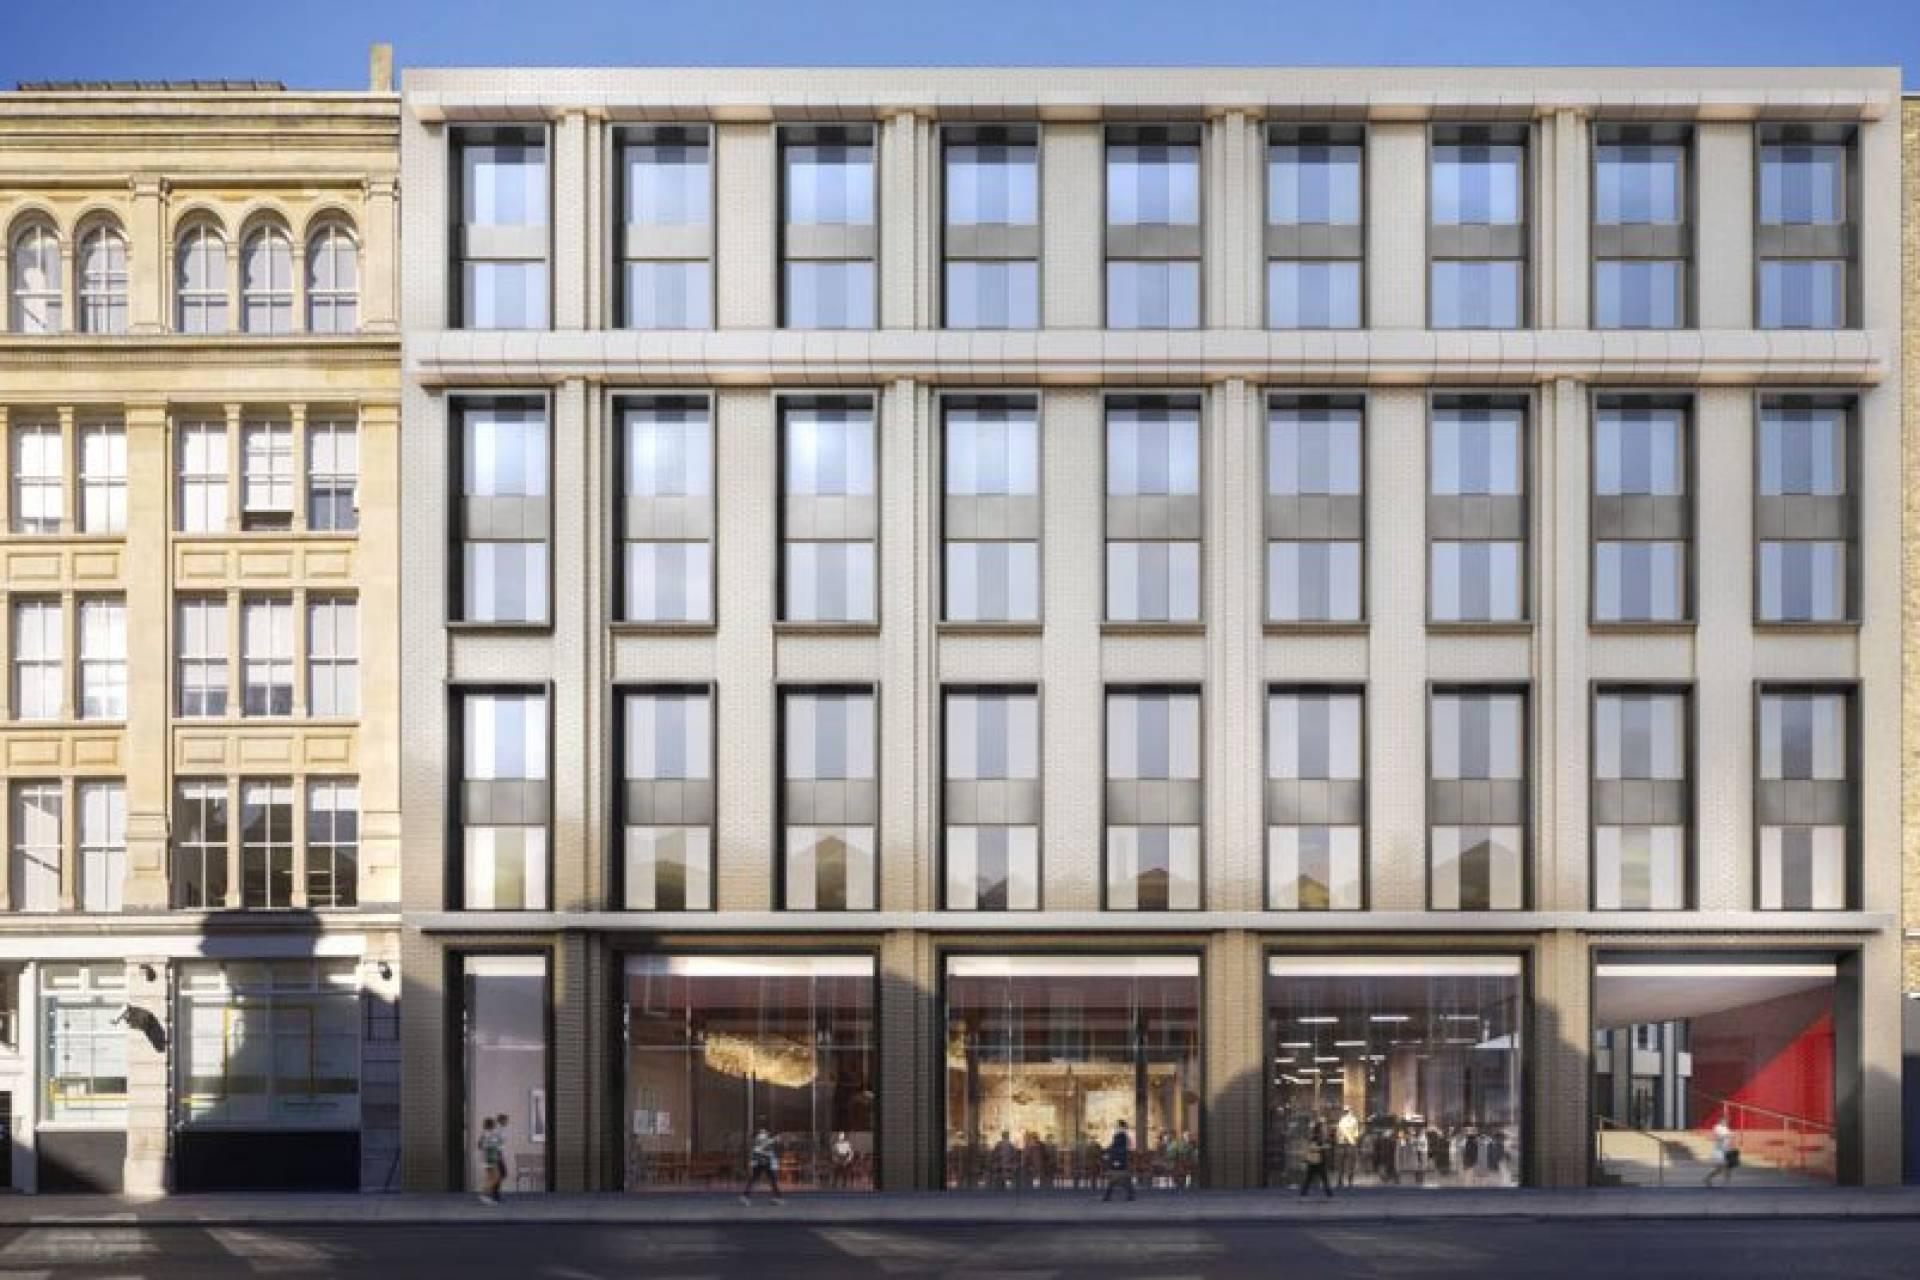 Yotel Clerkenwell Road Hotel facade